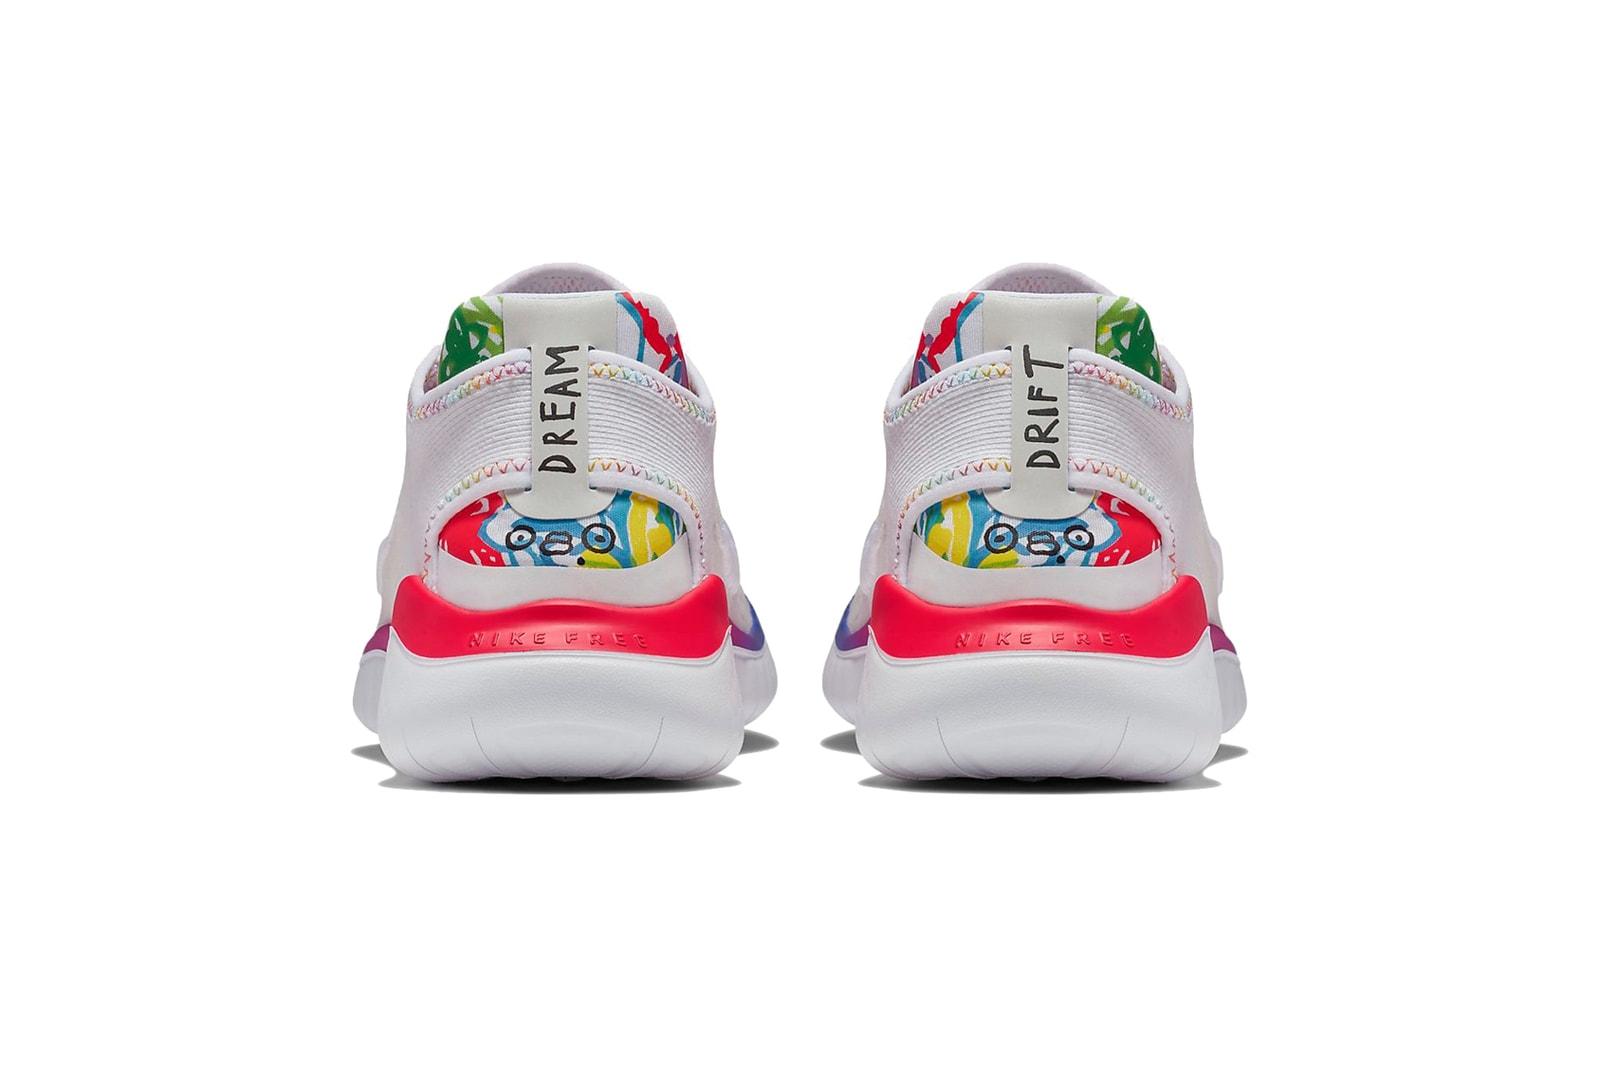 FLABJACKS x Nike Free RN「Free Expression」聯乘系列登場